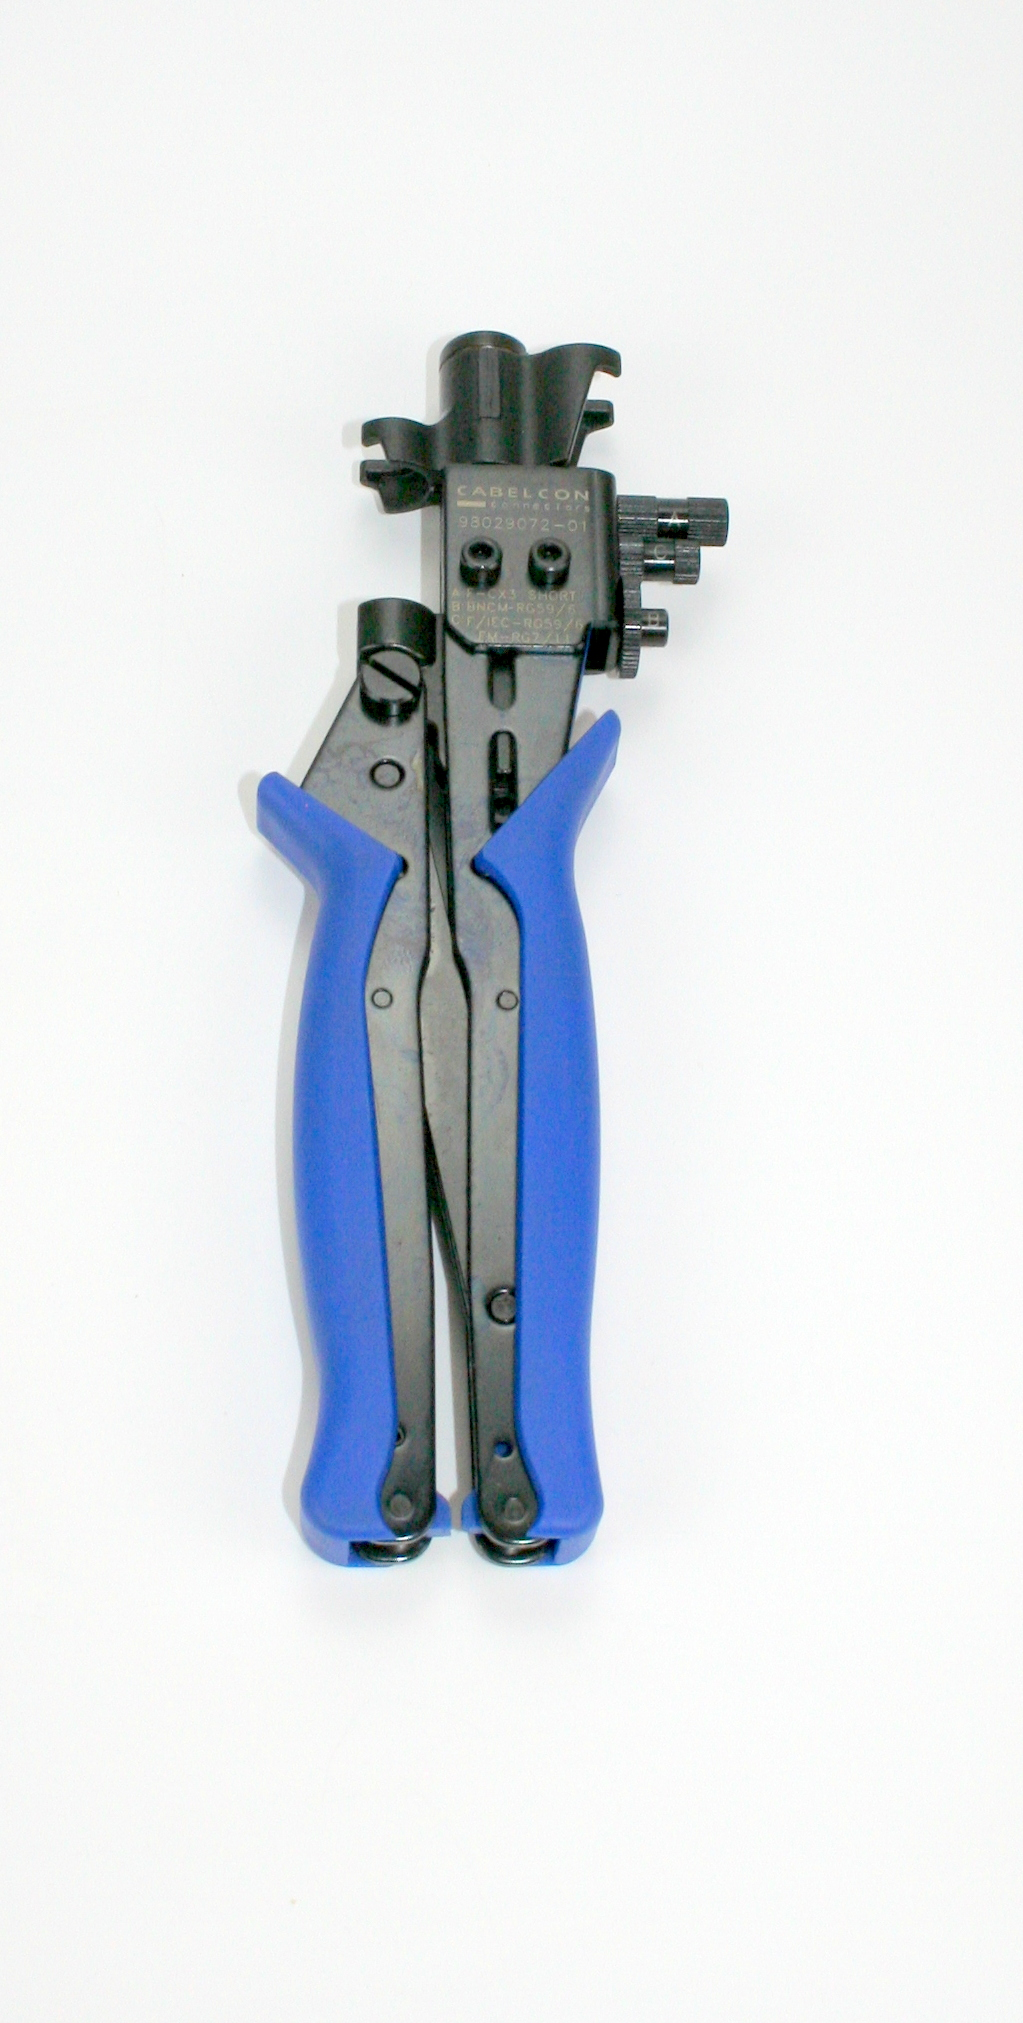 CX3 Compression tool